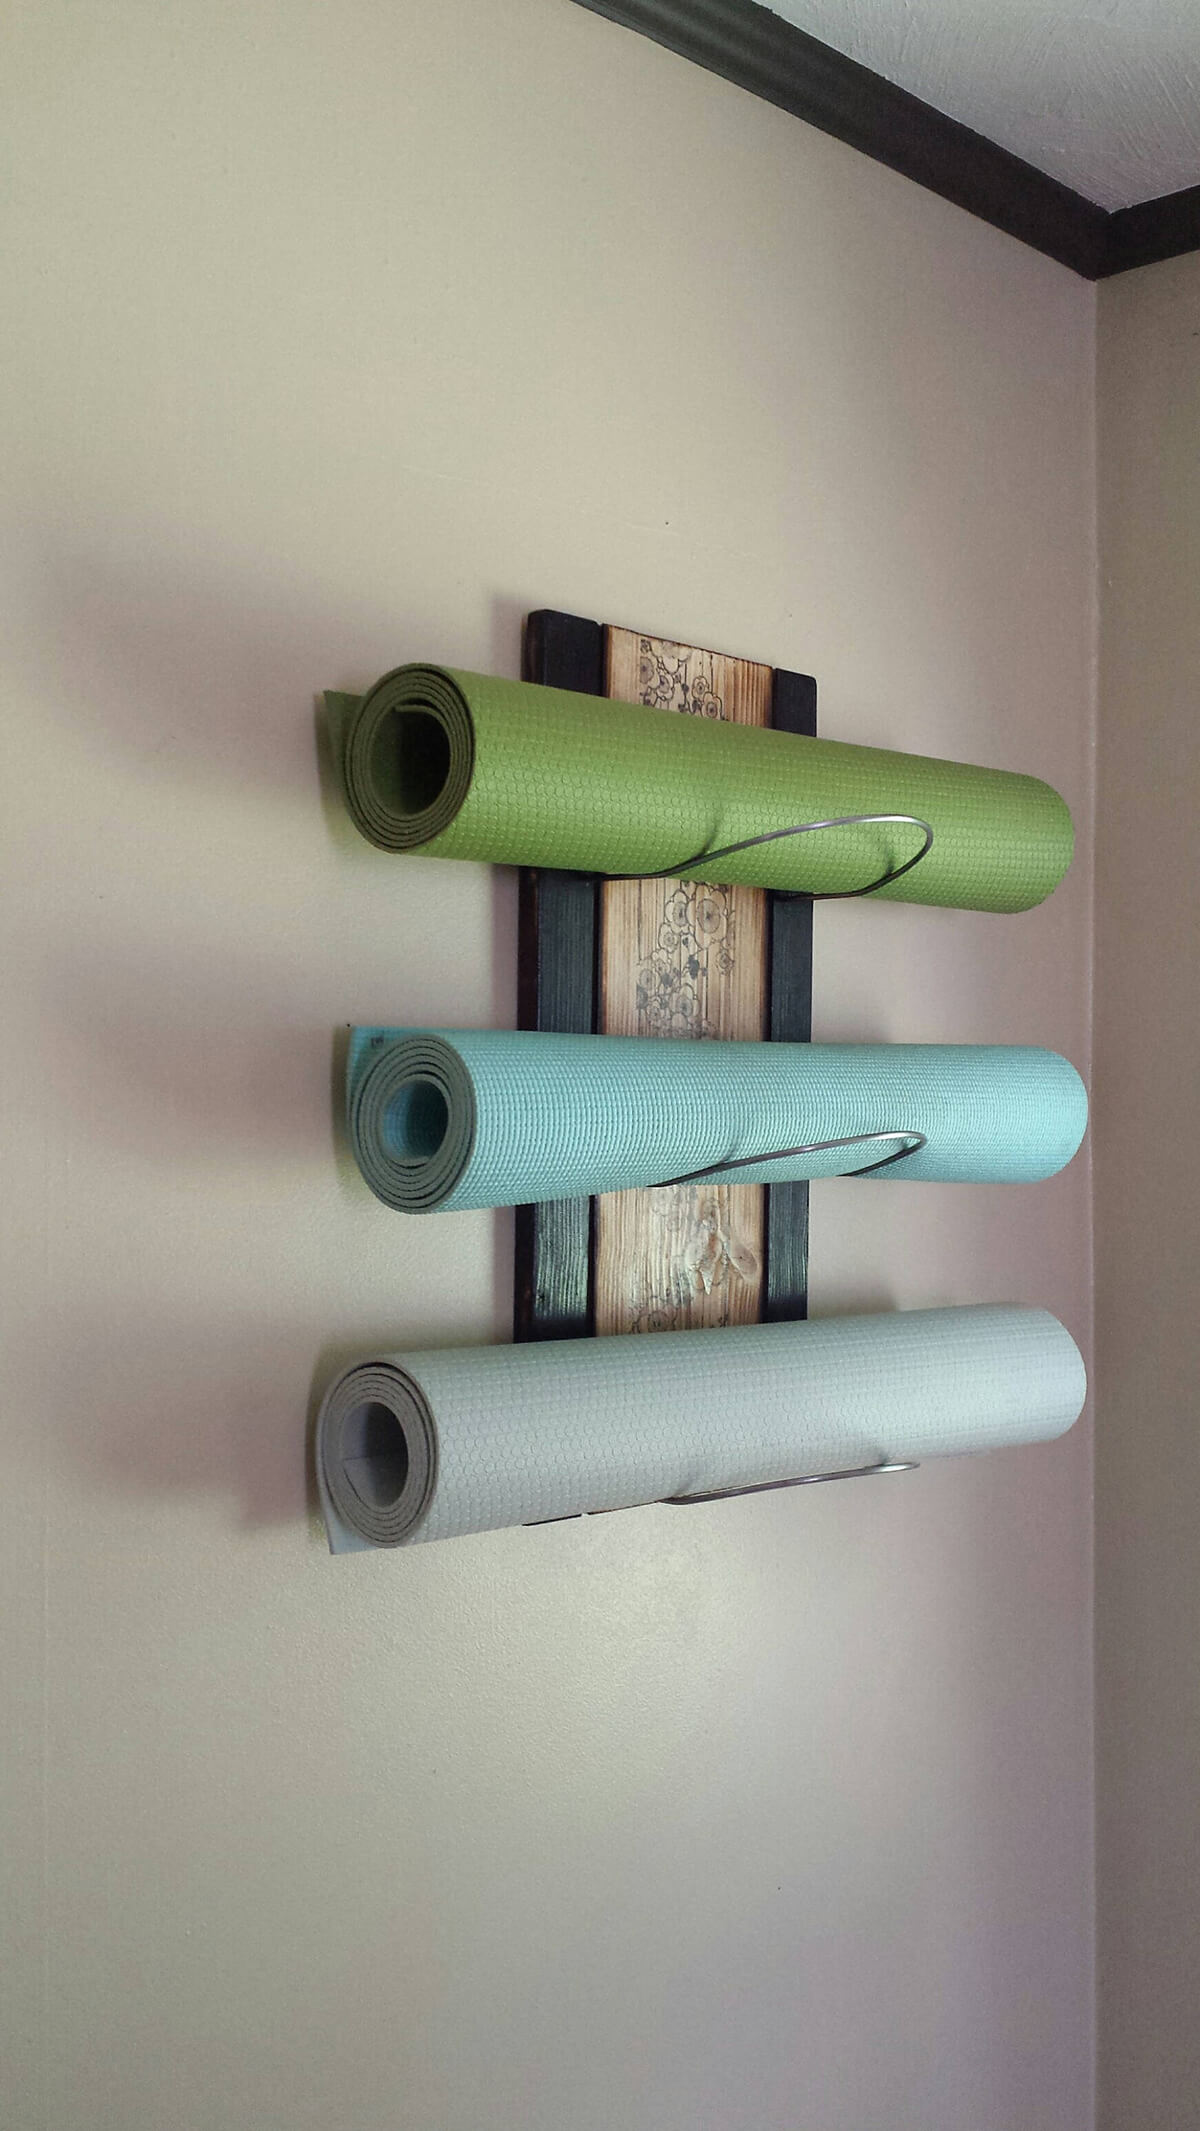 Wall-Mounted Yoga Mat Holder